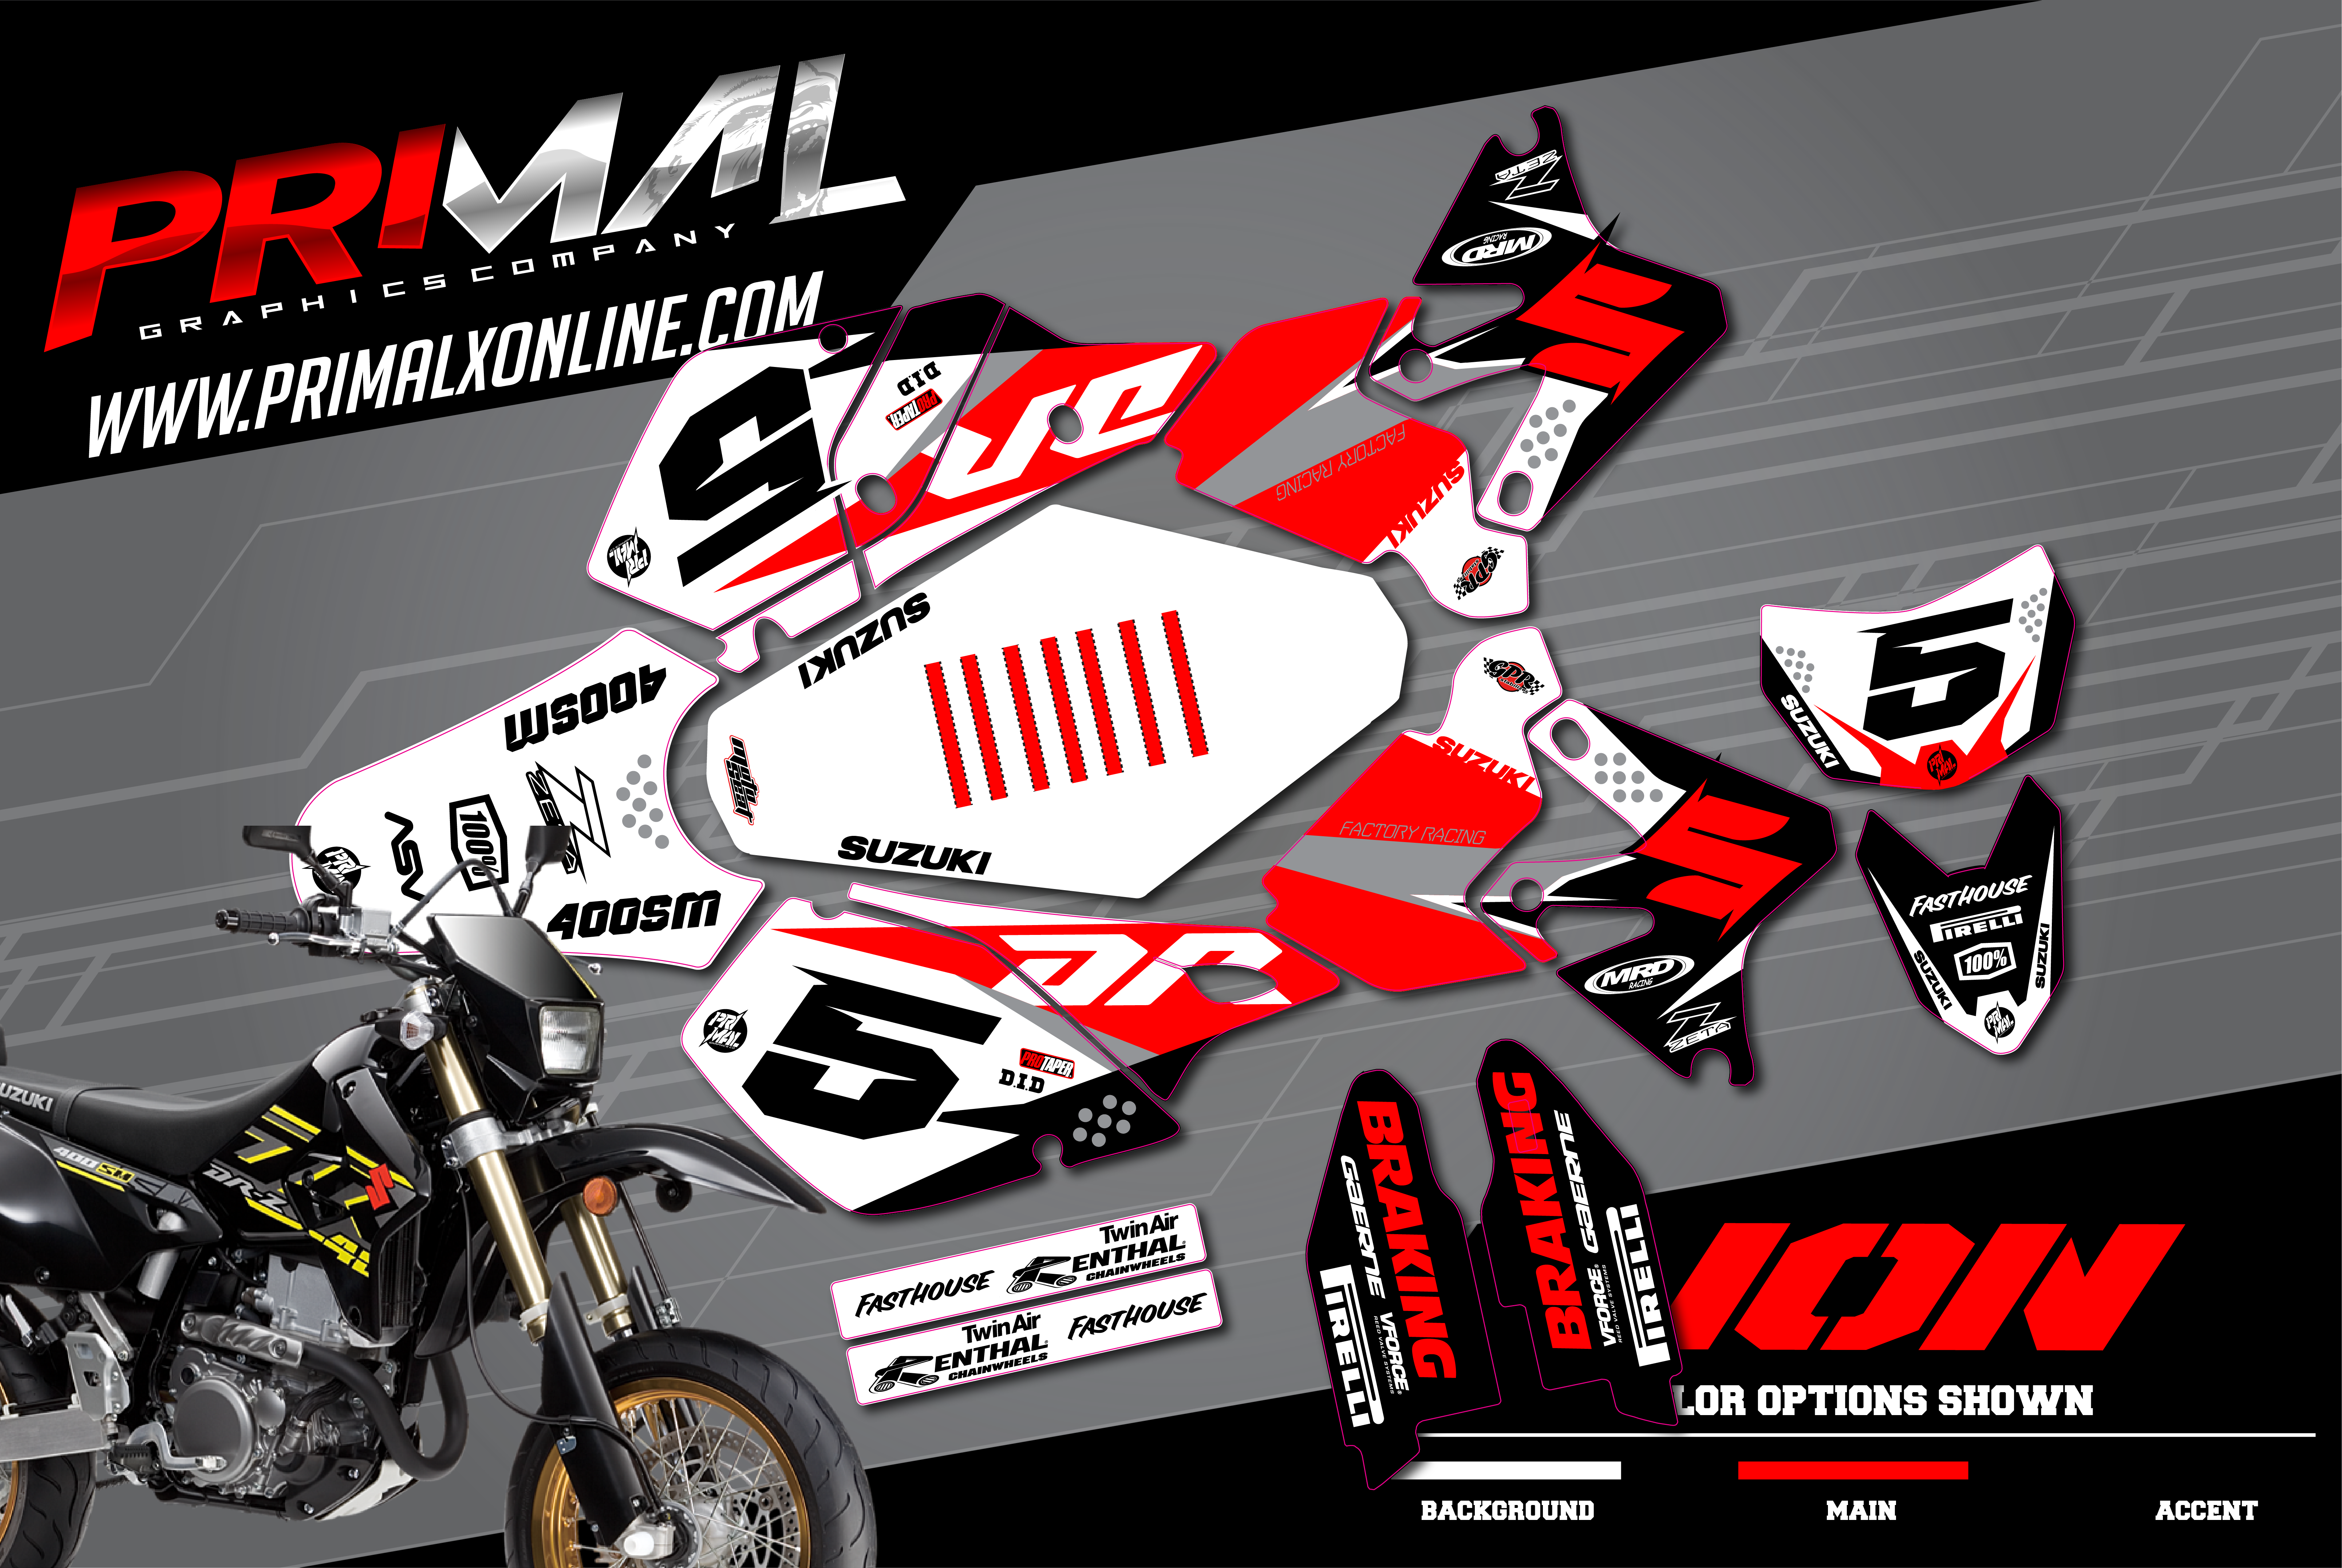 1_PRIMAL-X-MOTORSPORTS-PRIMAL-GRAPHICS-CO-2021-SUZUKI-DRZ400SM-MOTOCROSS-GRAPHICS-ION-SERIES-01-01-01